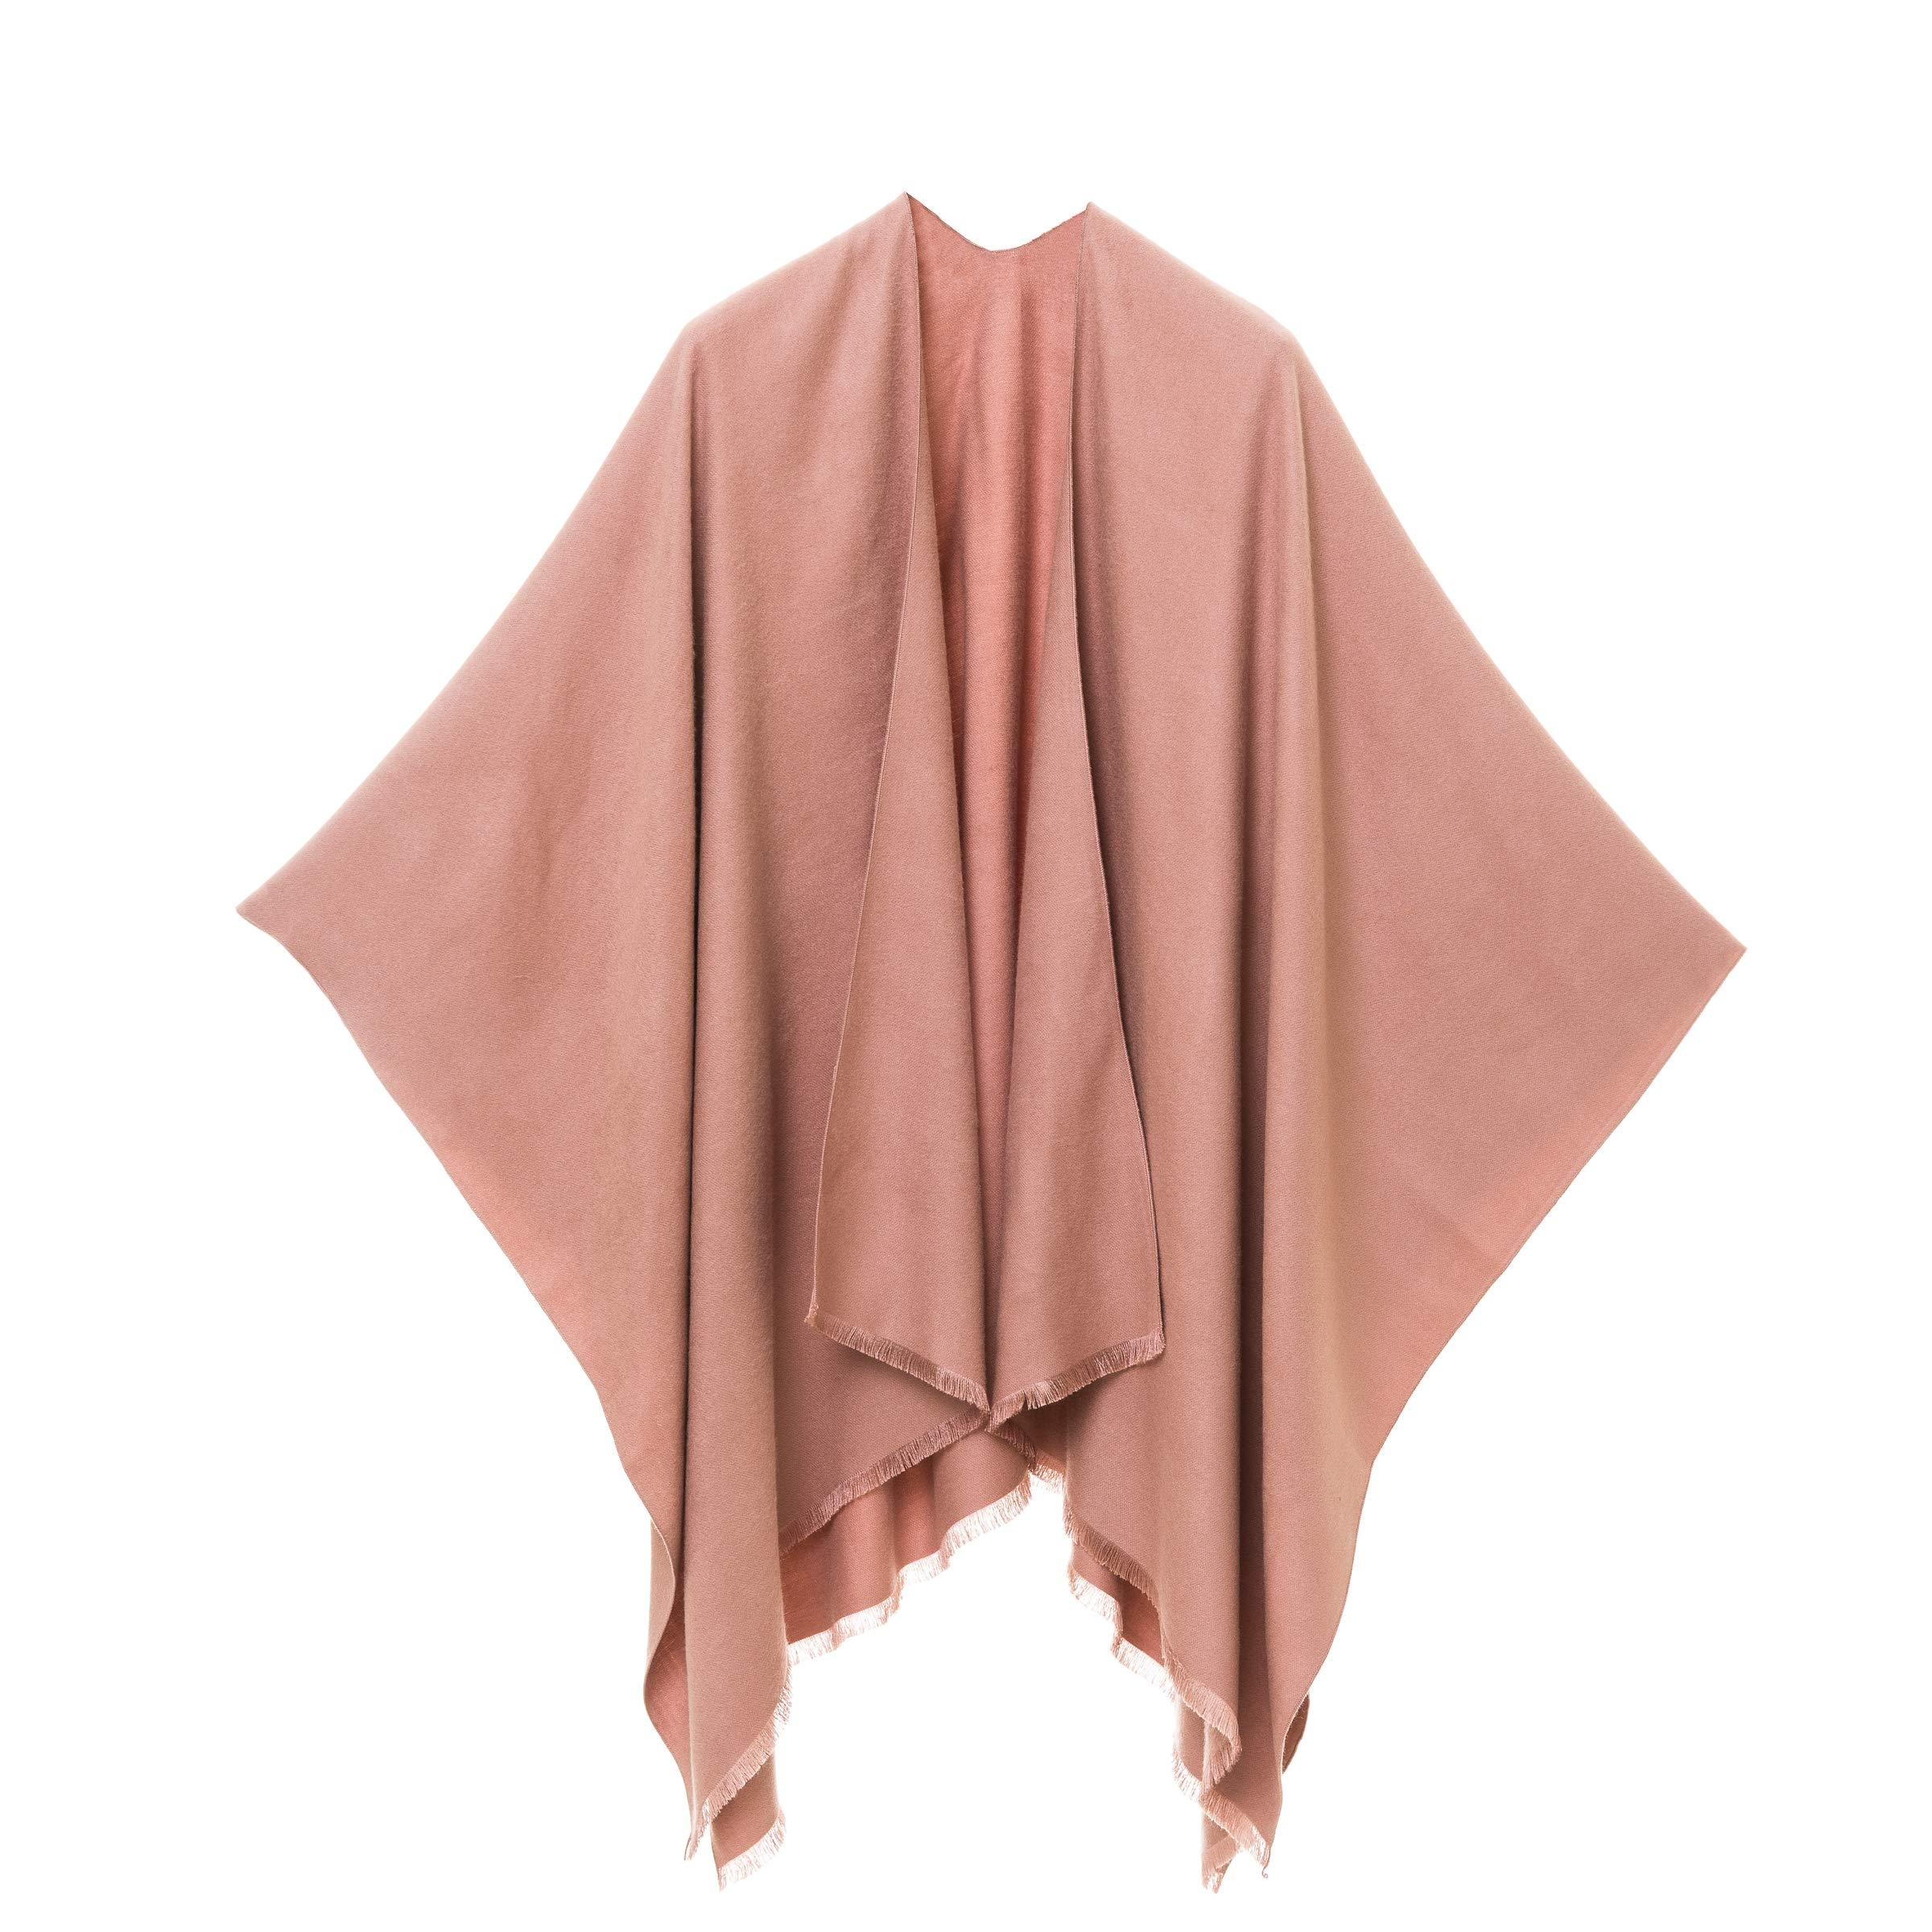 Cardigan Poncho Cape: Women Elegant Pink Cardigan Shawl Wrap Sweater Coat for Winter (Pink)